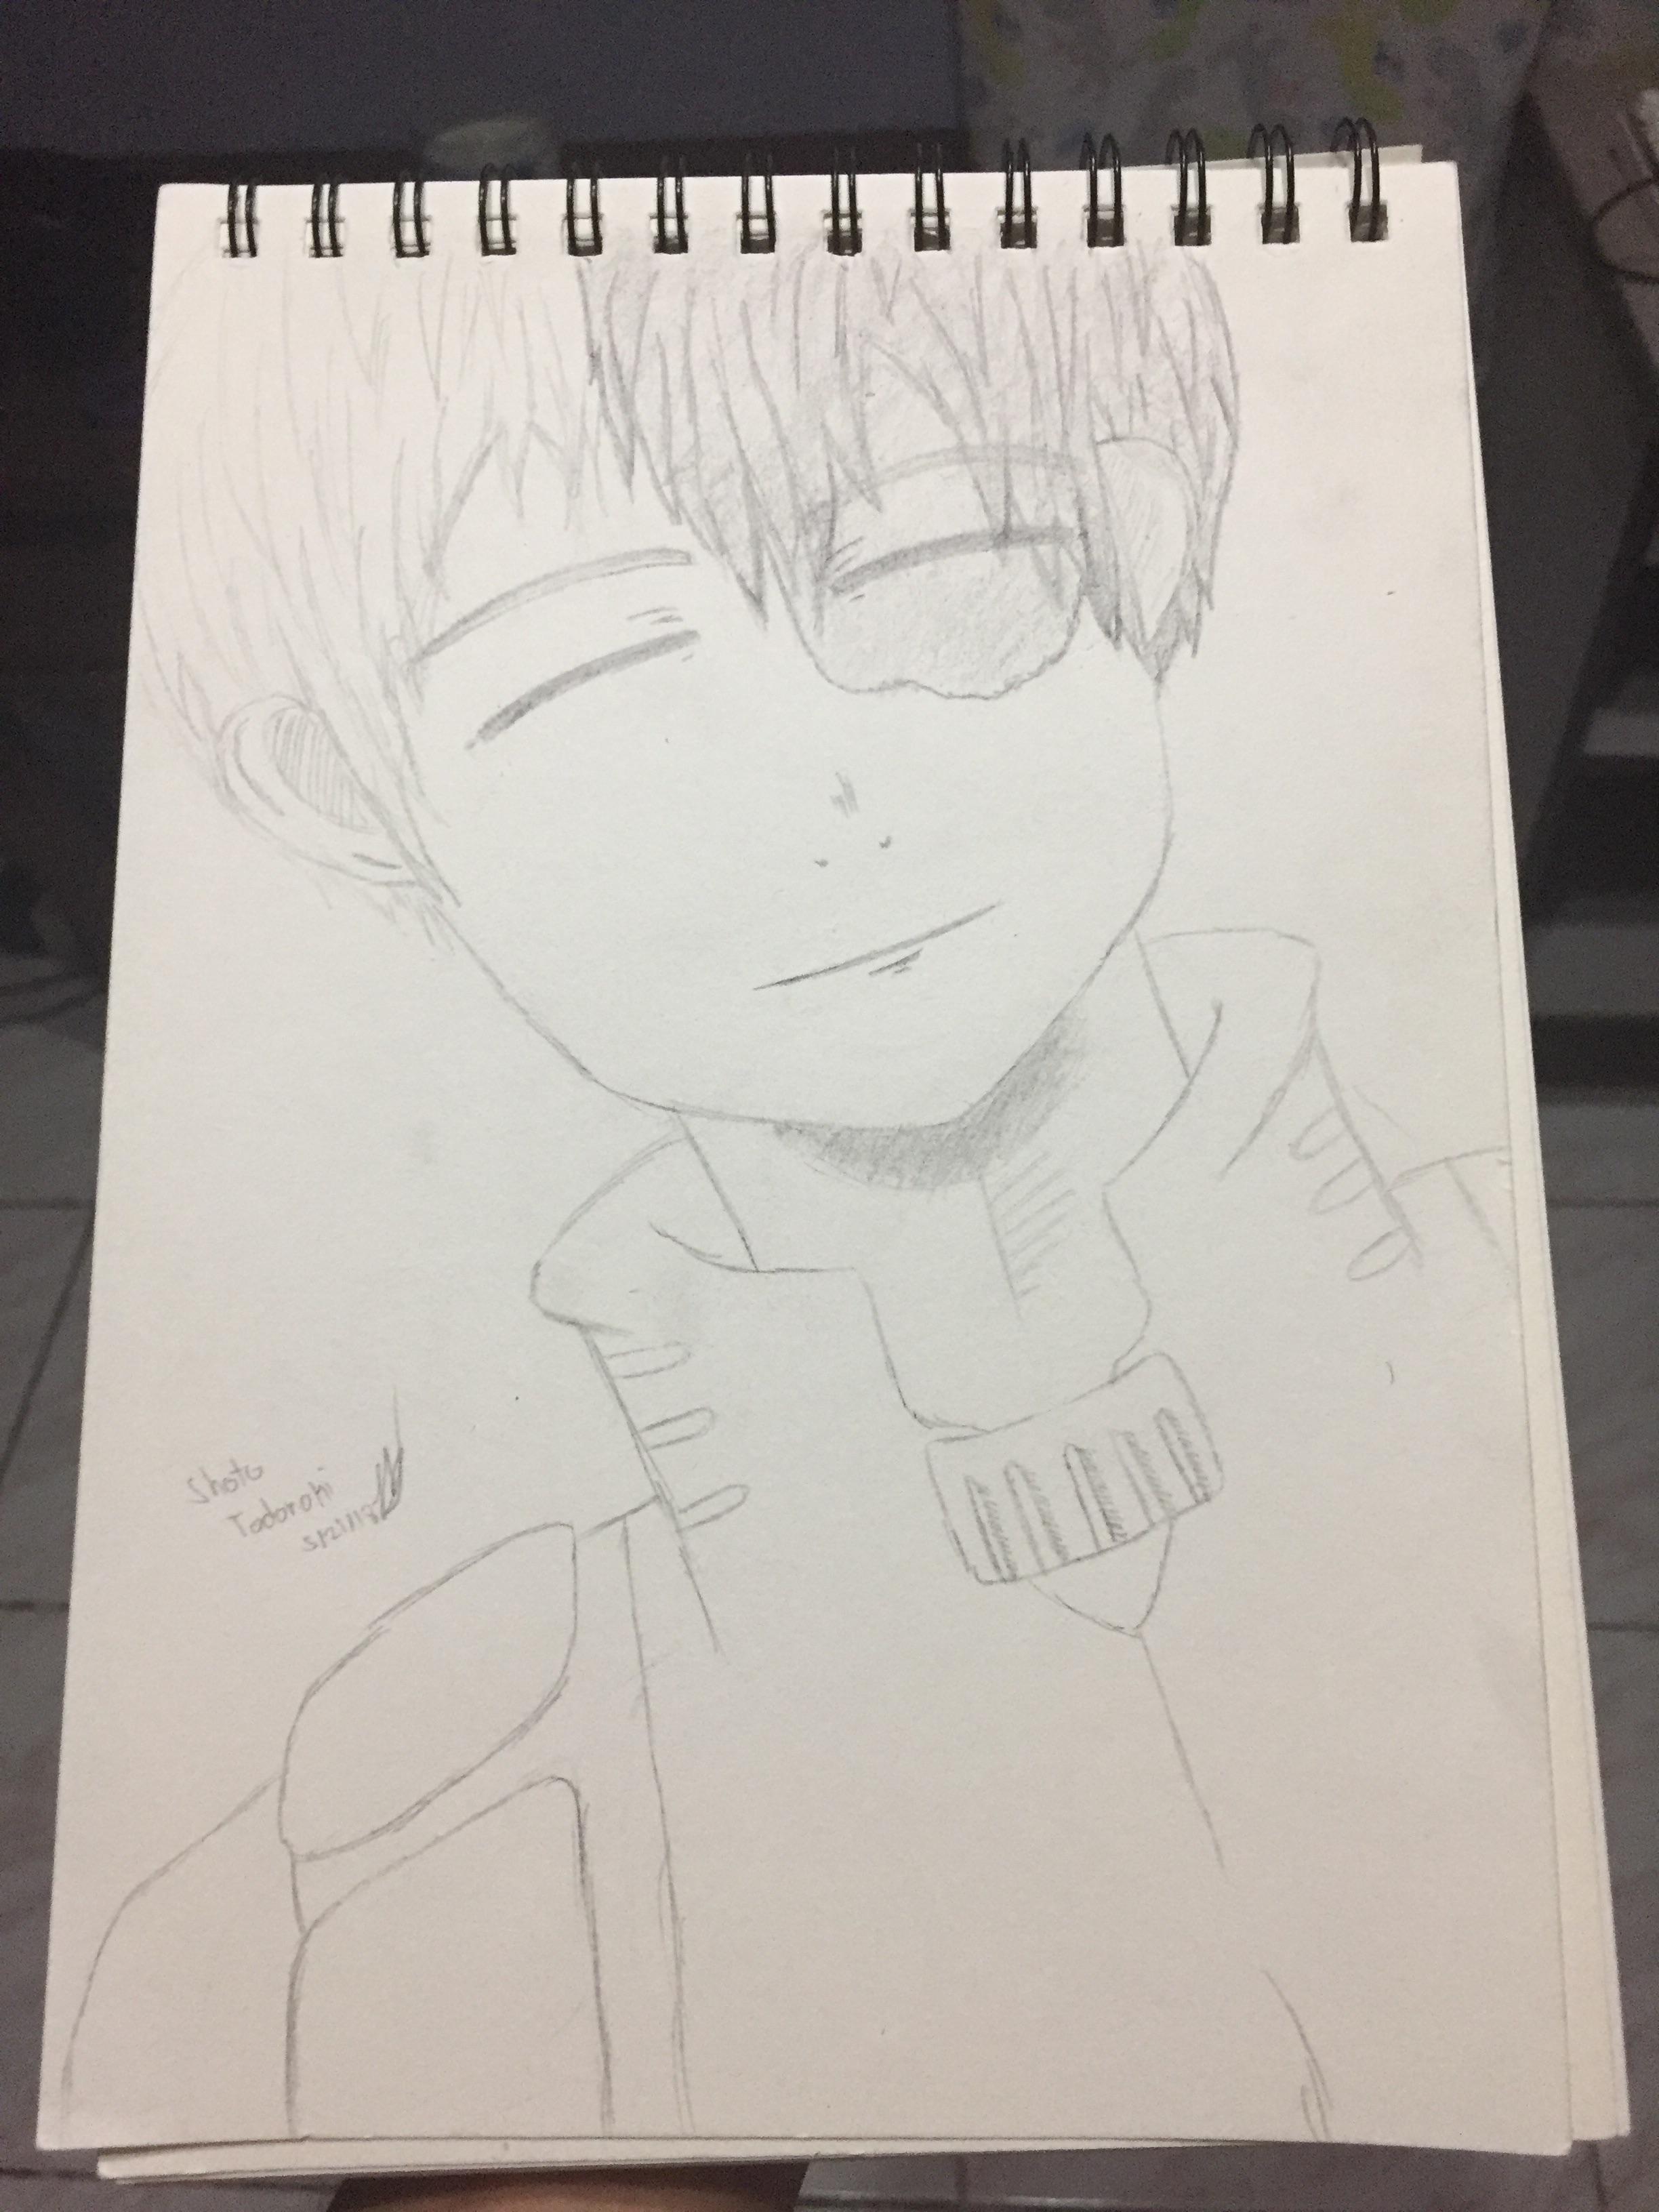 Todoroki Drawing Cute : todoroki, drawing, Shoto, Todoroki, Drawing, Where, Smiling, *pretty, BokuNoHeroAcademia